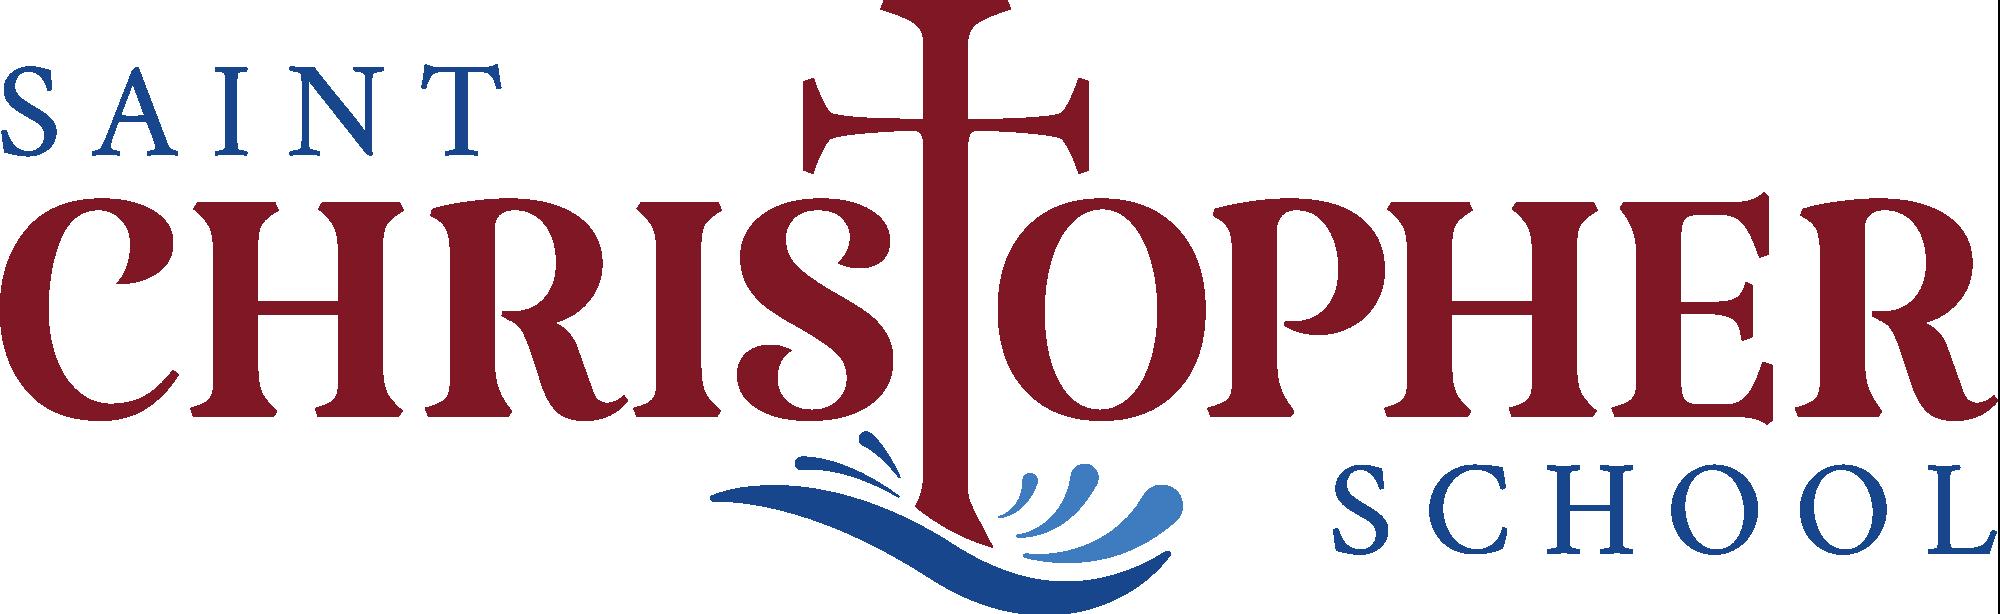 St-Christopher-School-Logo.png